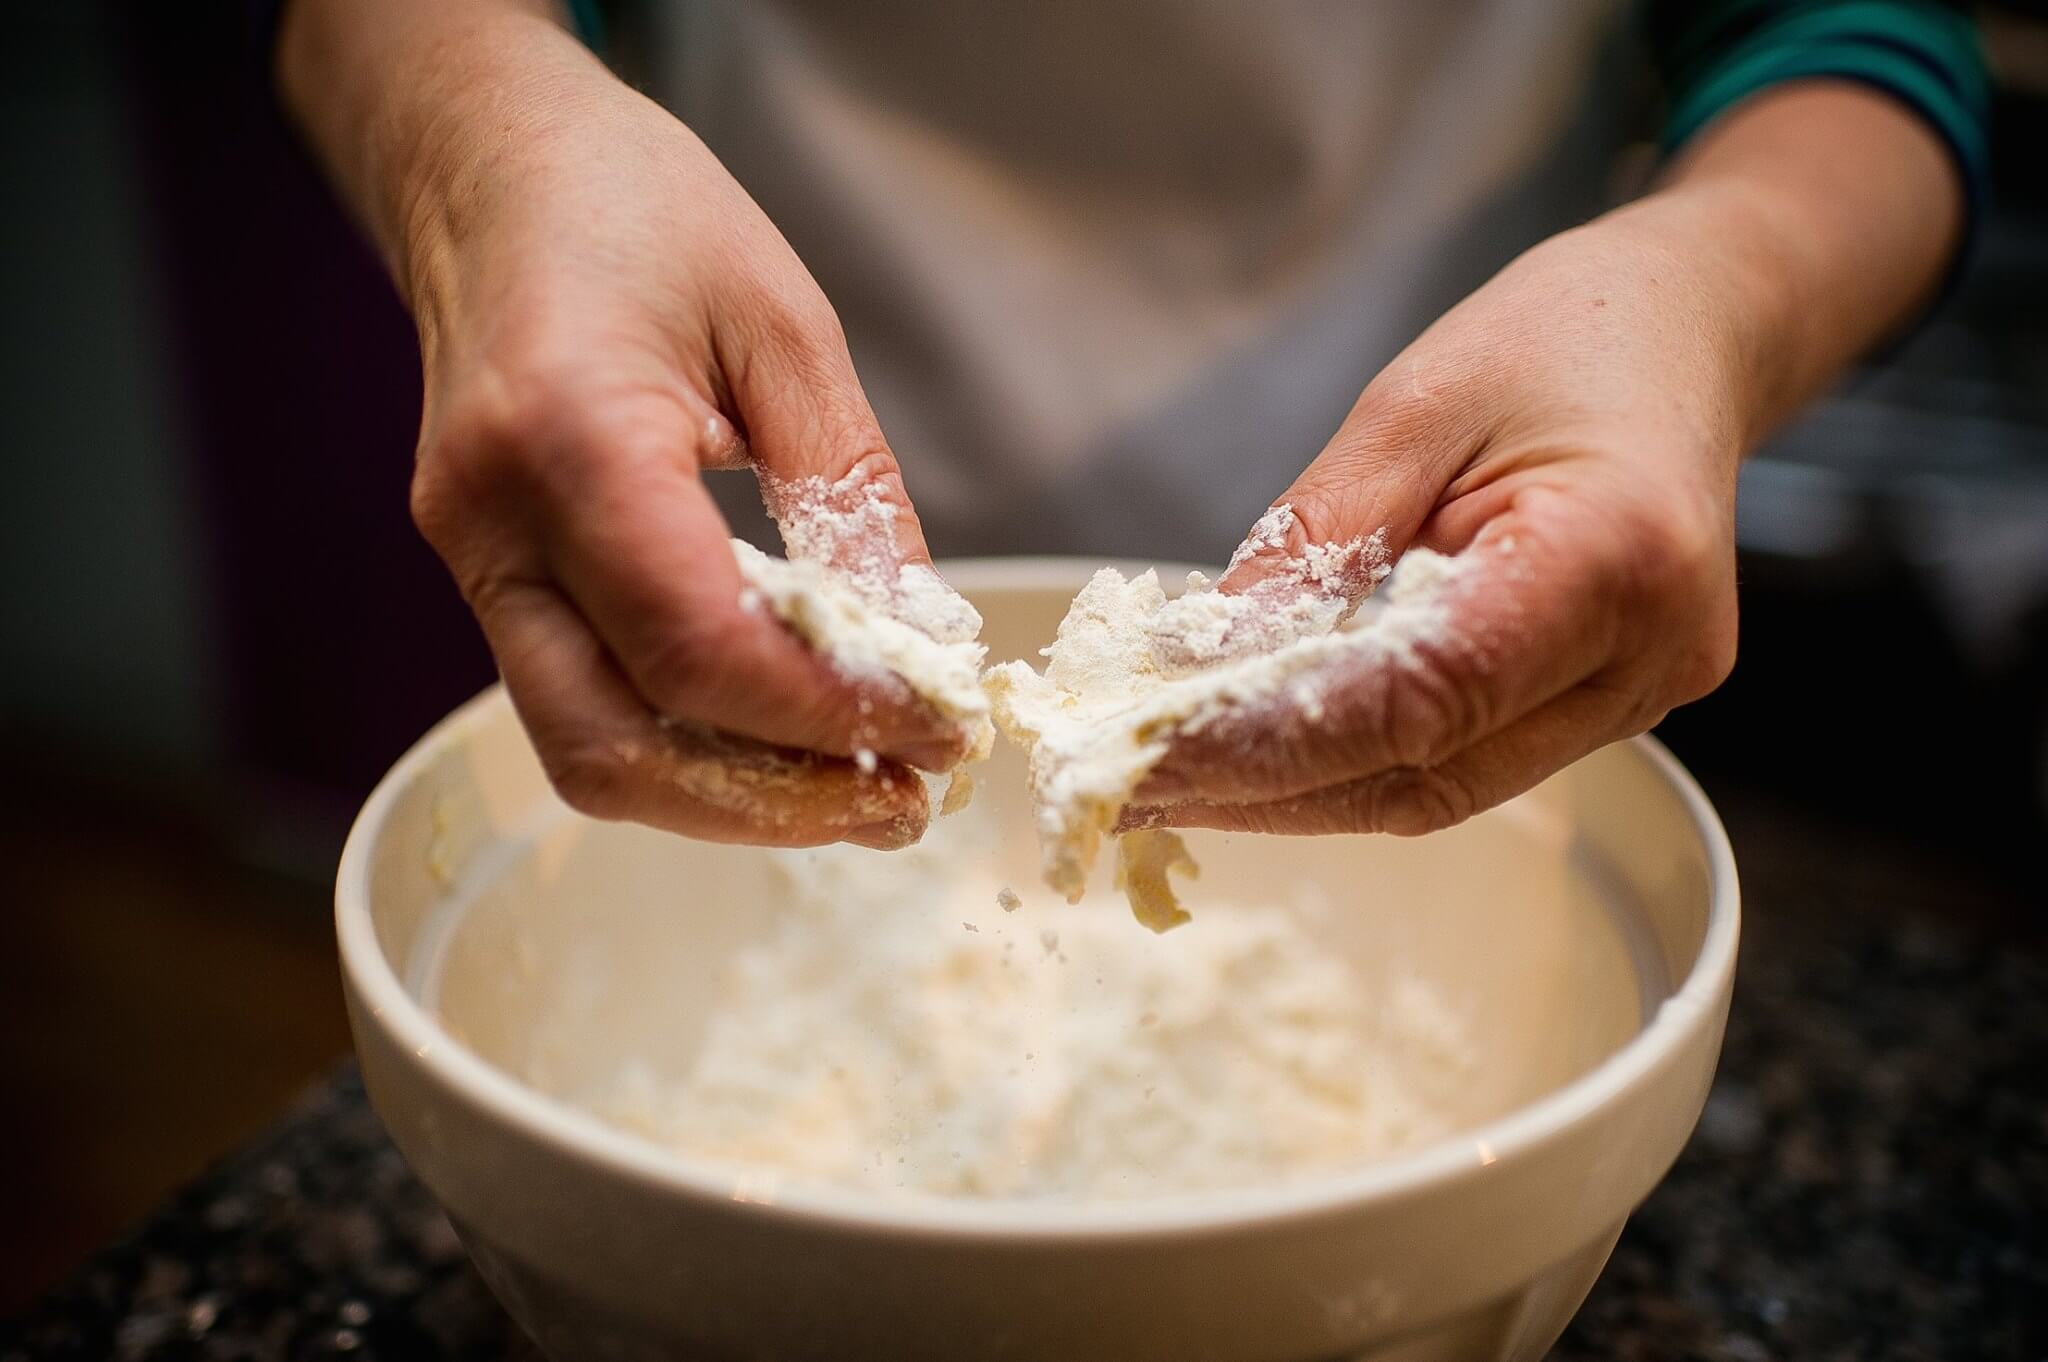 Gluten-Free Cookery Courses in London, gluten free bread making course london, gluten free baking class london, gluten free london, gluten free cookery course london, gluten free cookery class london